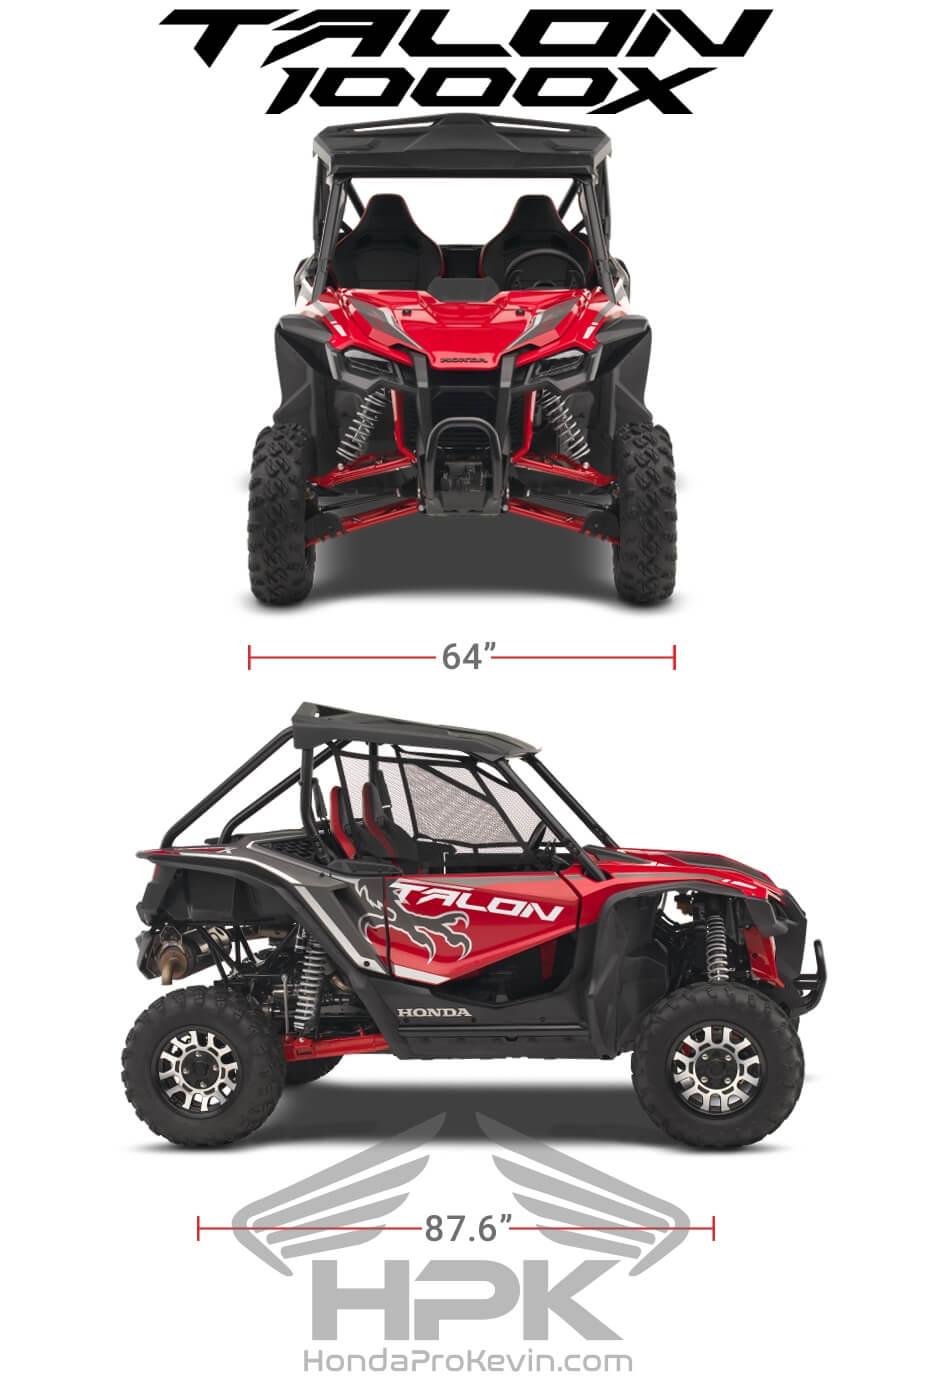 Honda TALON 1000X Dimensions: Width, Length, Wheelbase Specs | TALON 1000 X Sport SxS / UTV / Side by Side ATV